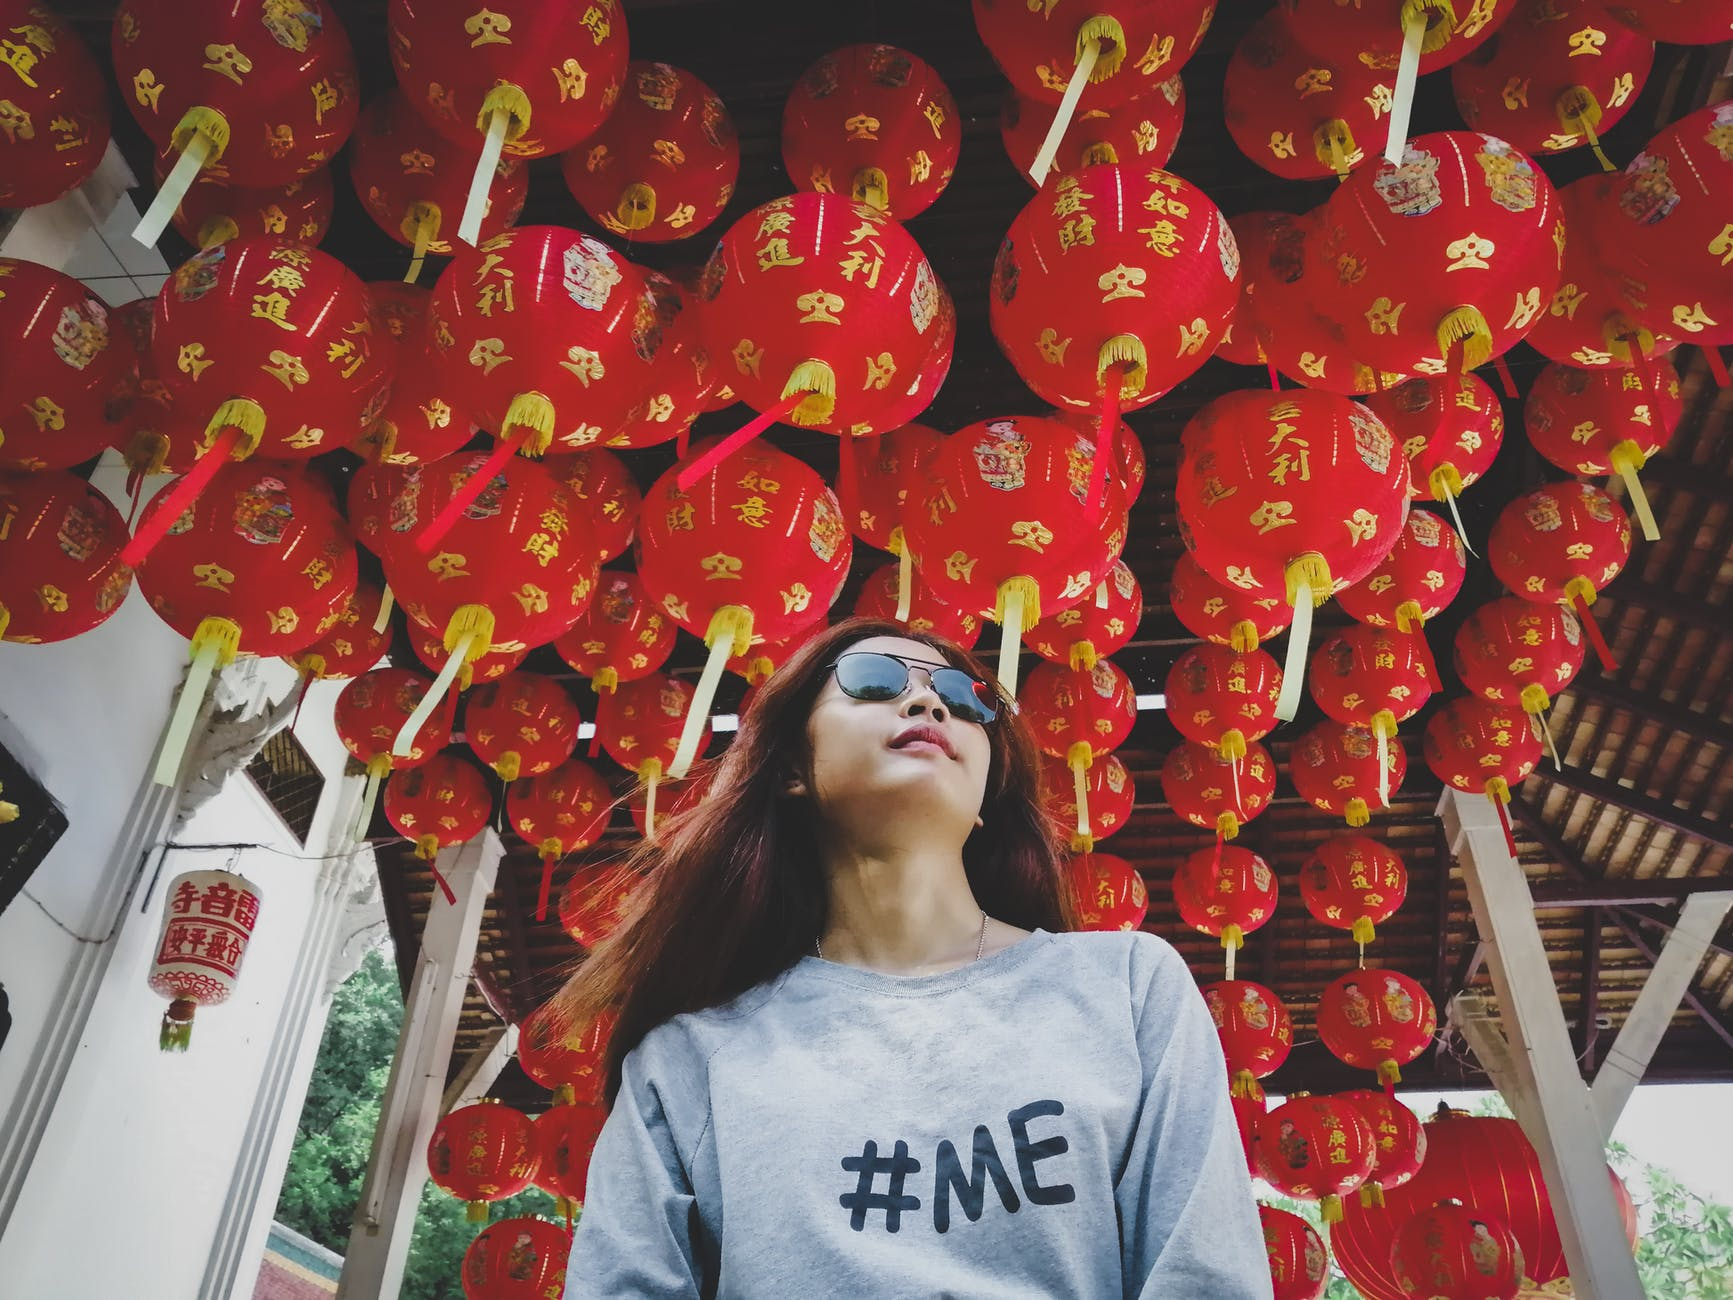 Women with #me shirt